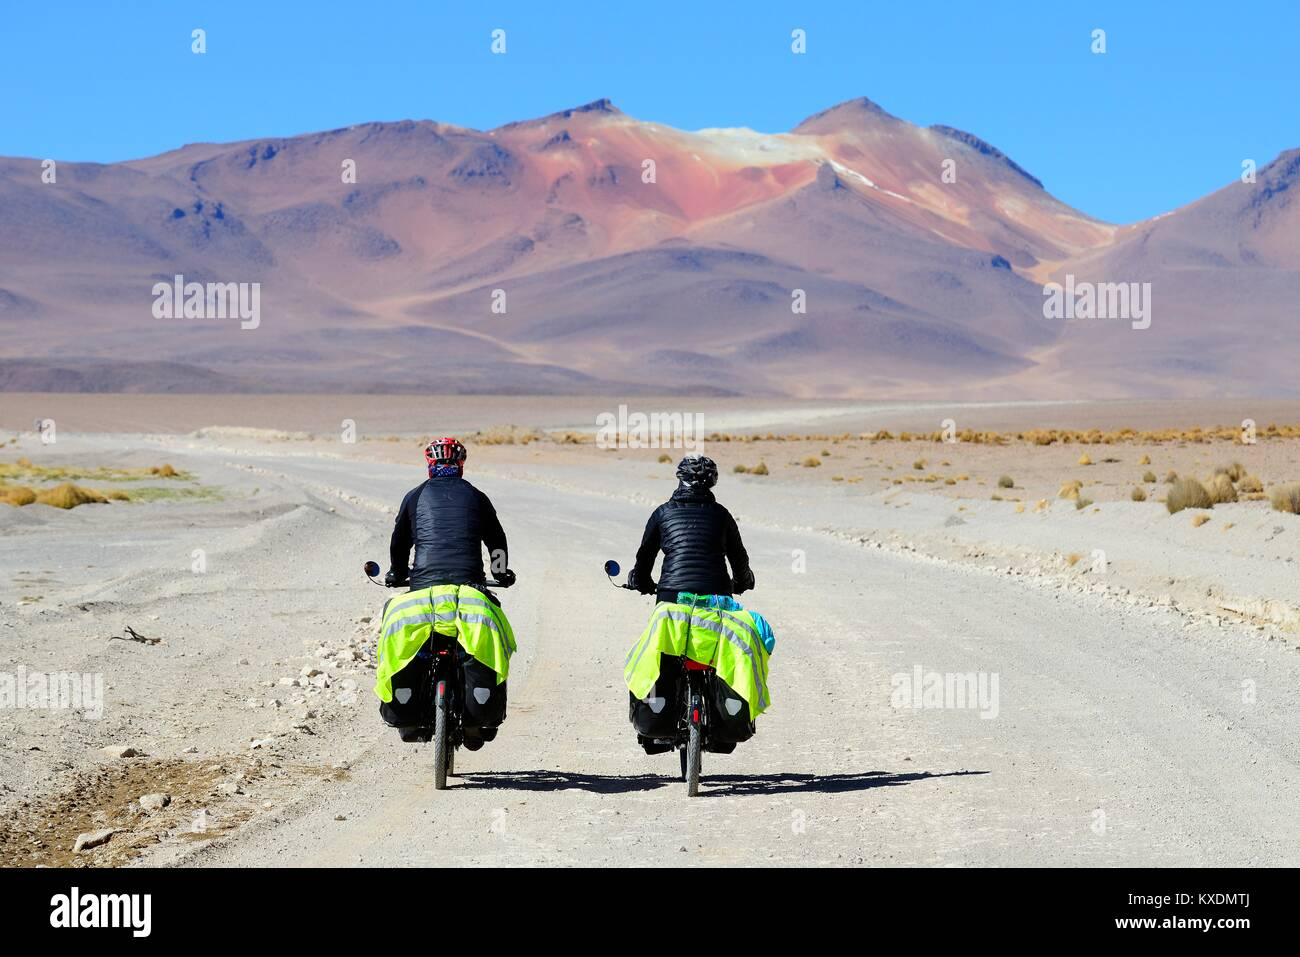 Two cyclists with luggage ride on the runway of the lagoon route, Reserva Nacional de Fauna Andina Eduardo Abaroa, - Stock Image